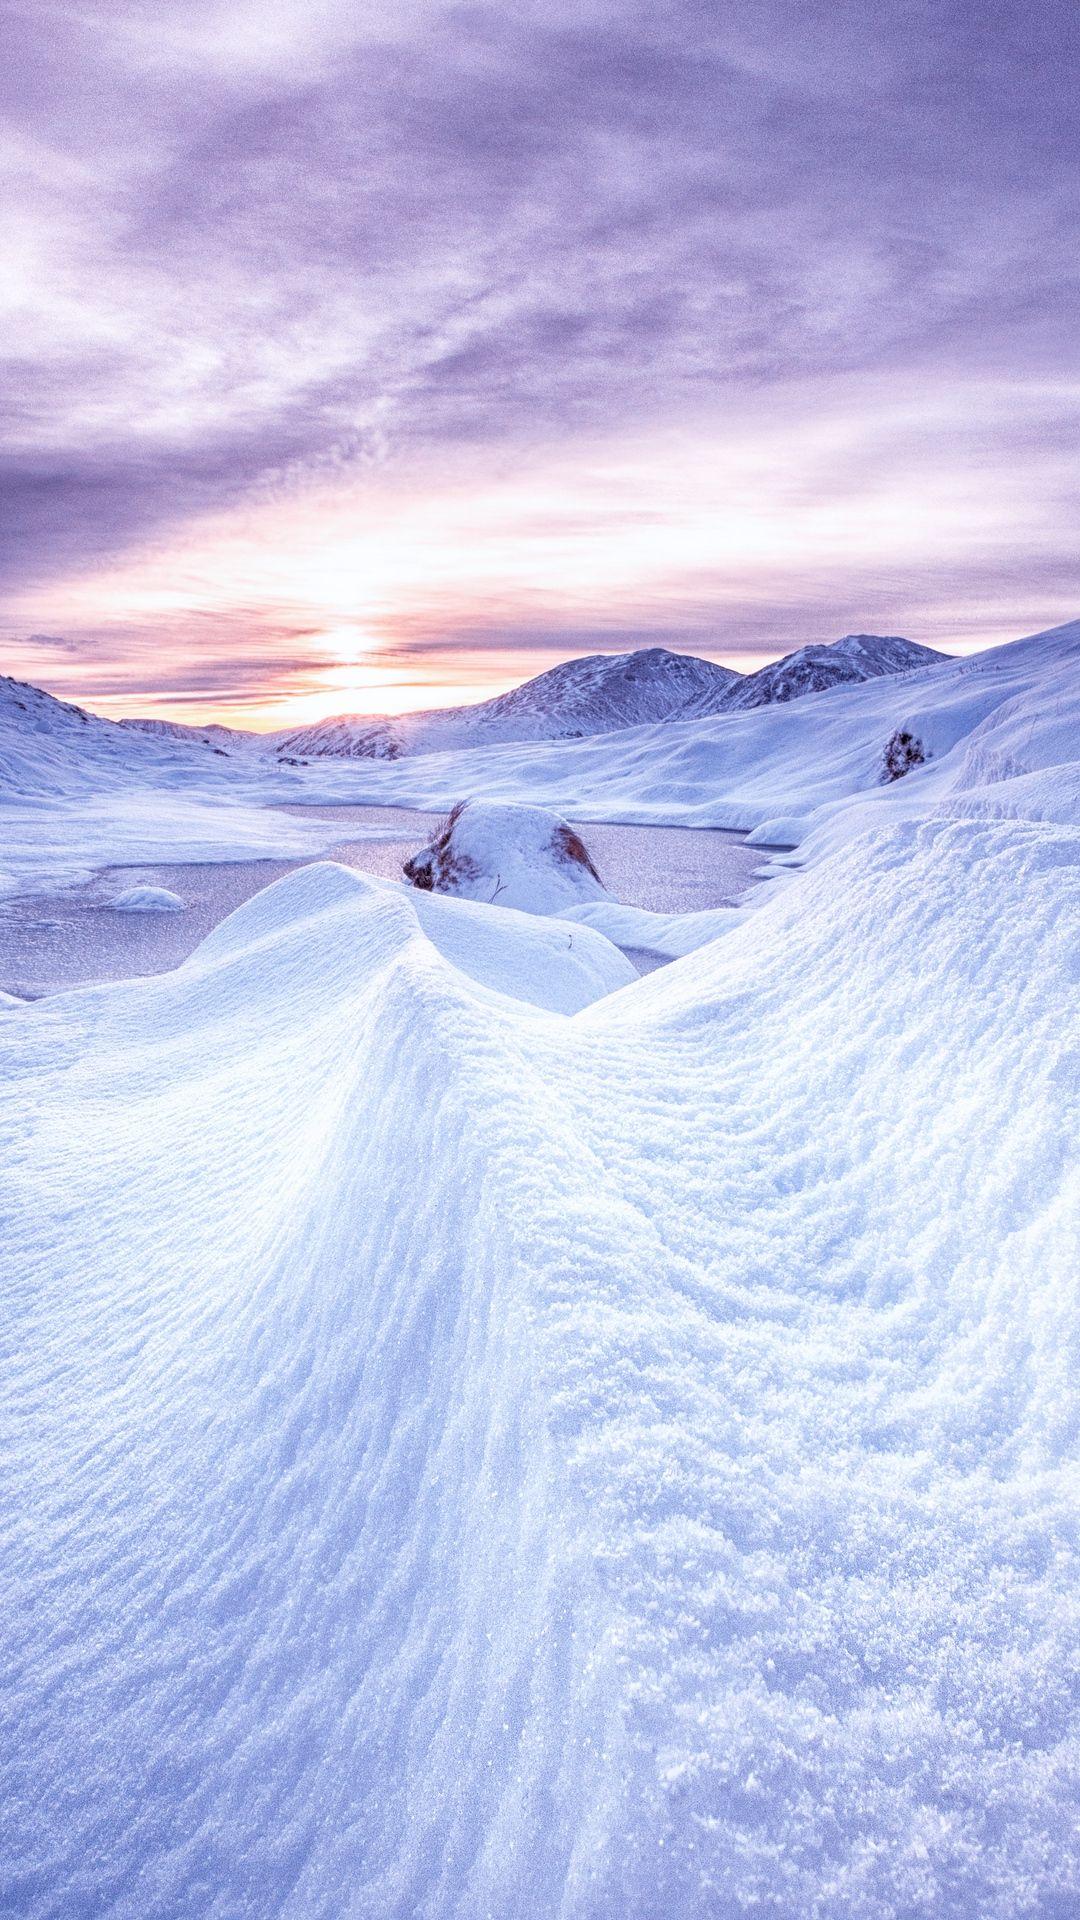 1080x1920 Wallpaper Snow Mountains Dawn Scotland Winter